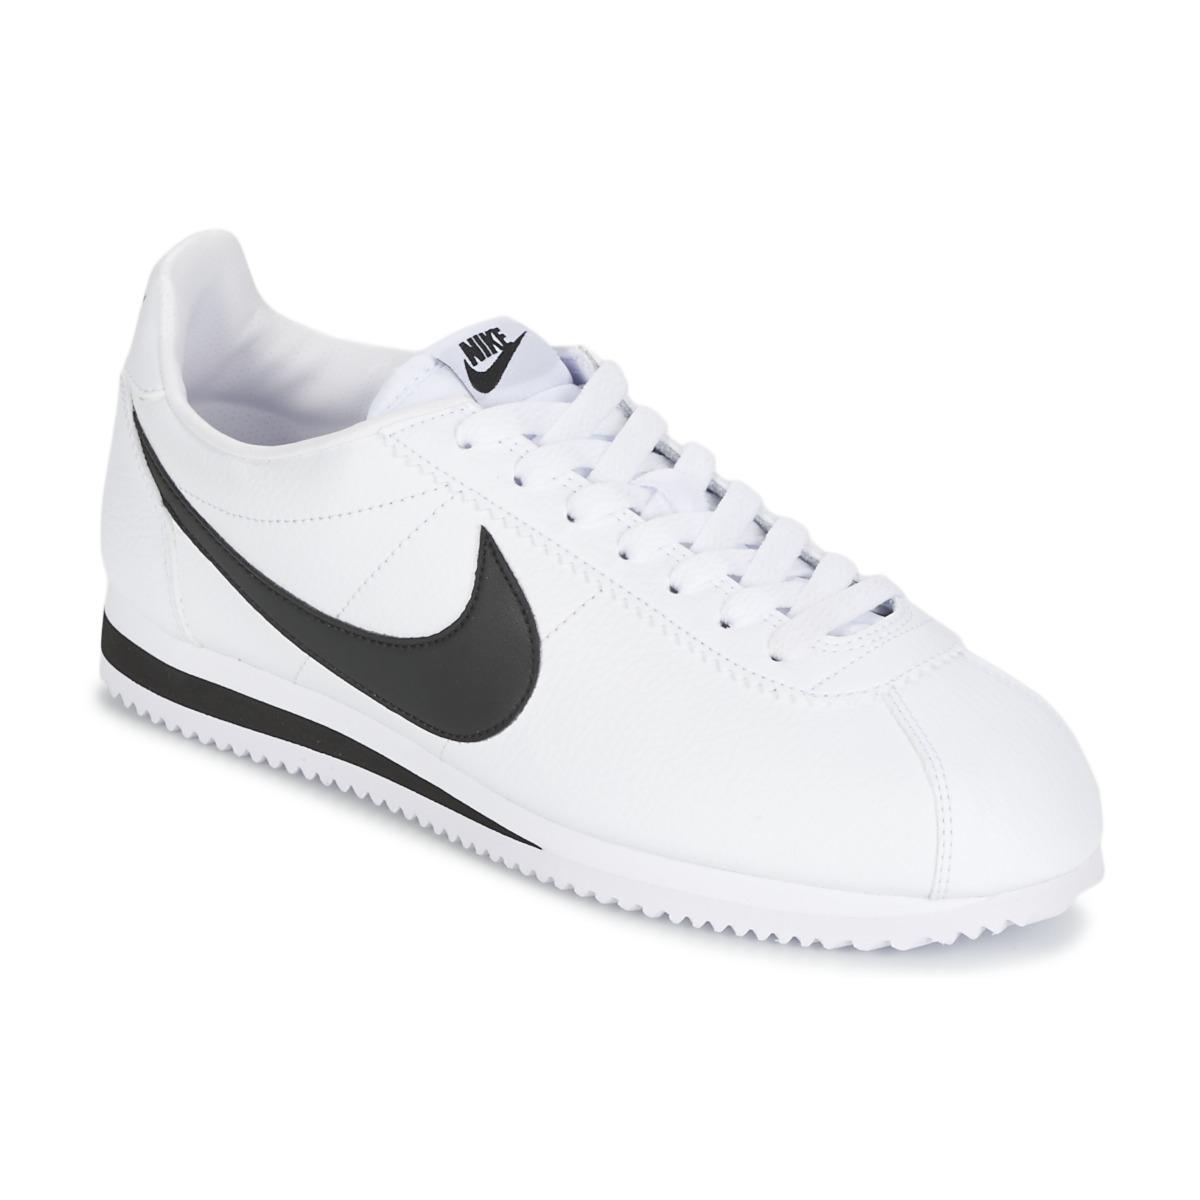 buy online db245 c1873 Nike CLASSIC CORTEZ LEATHER Vit   Svart - Fri frakt hos Spartoo.se ! - Skor  Sneakers Herr 759,00 kr